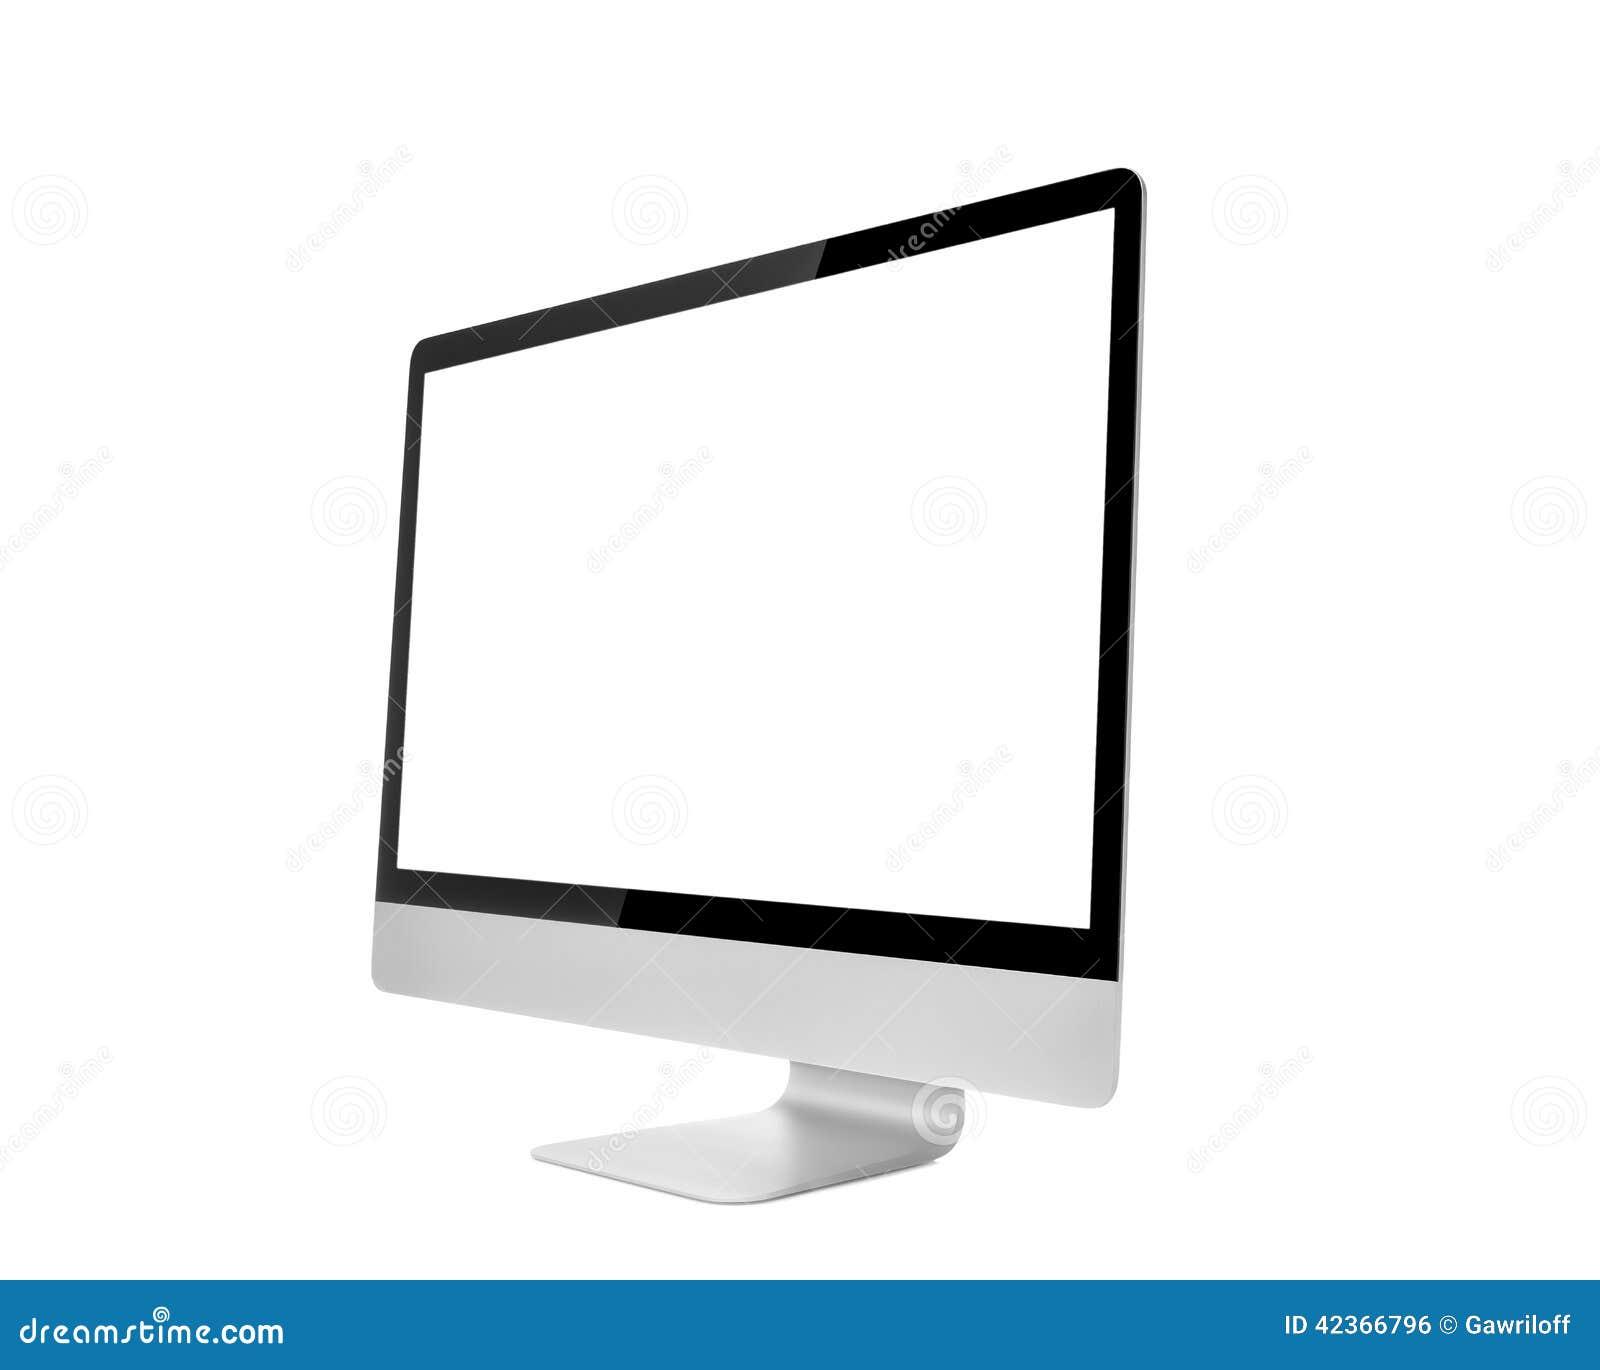 Computer Monitor, like mac with blank screen.